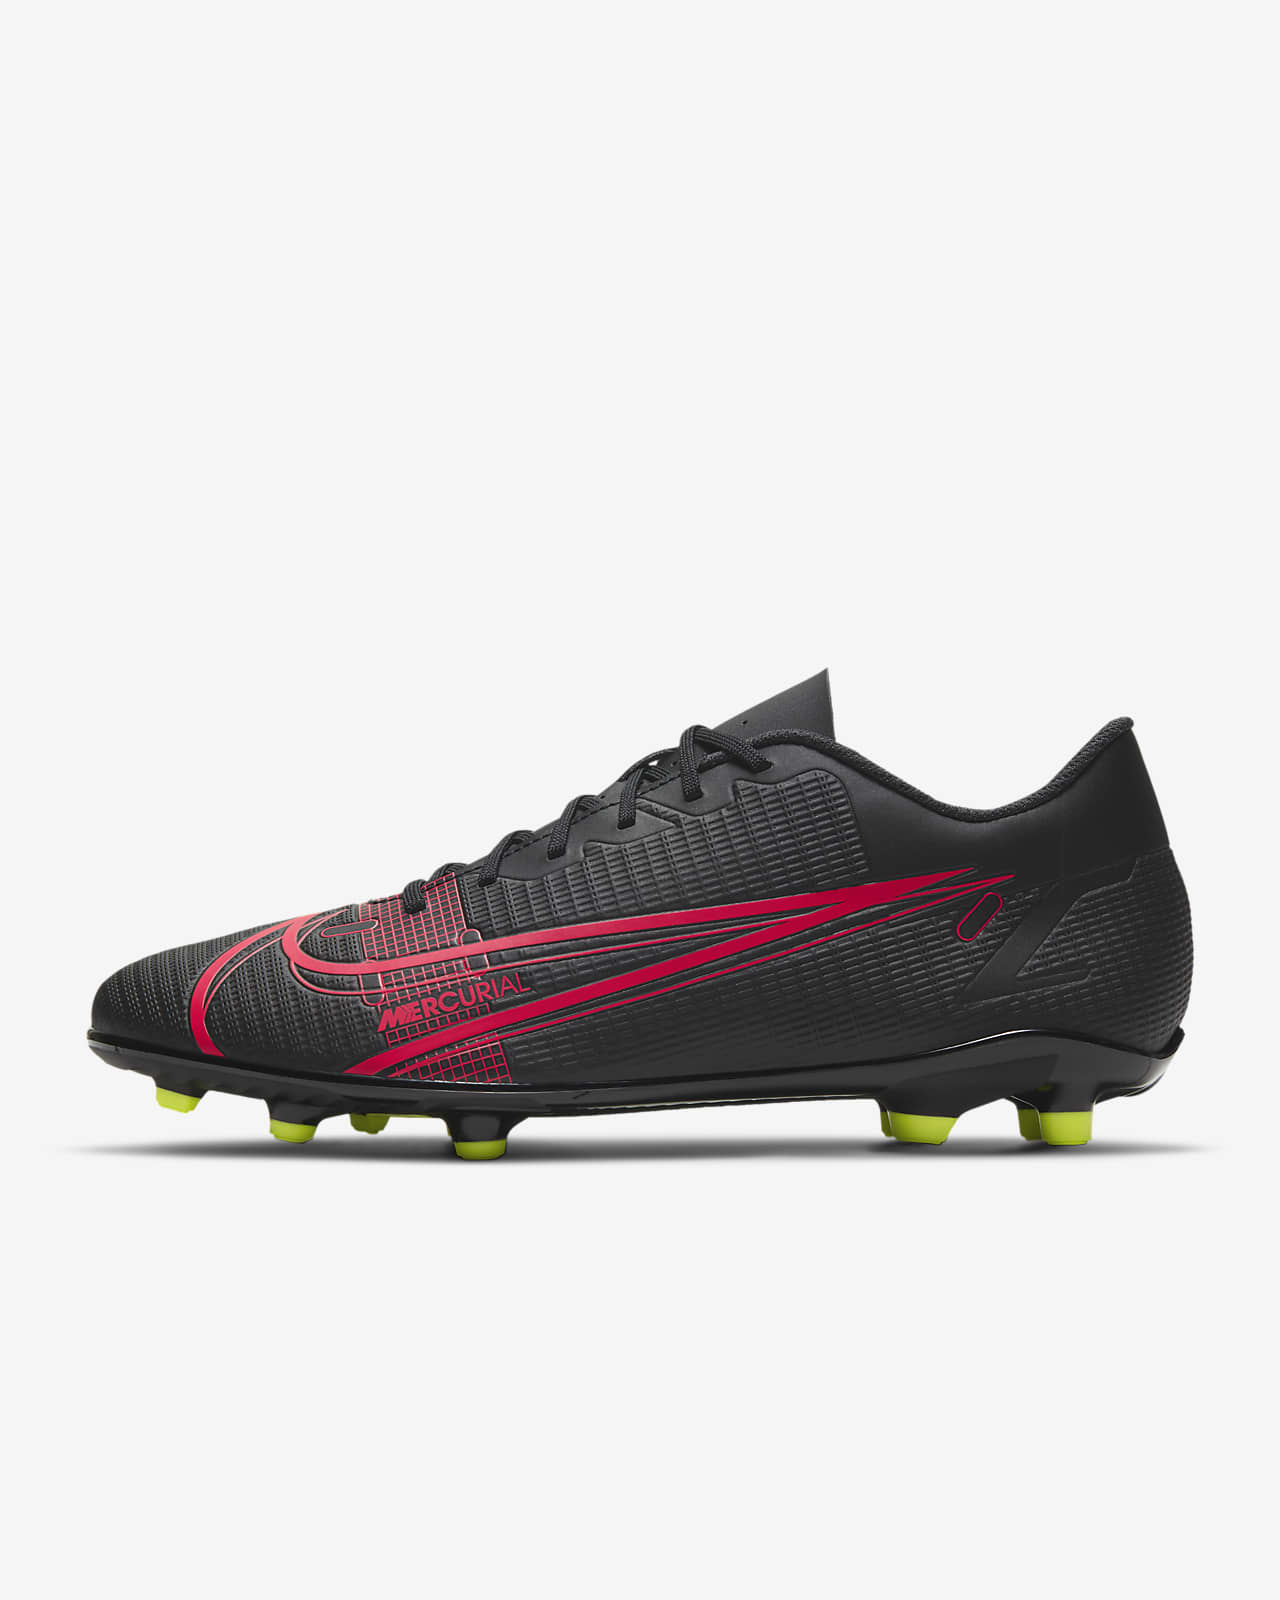 Chaussure de football multi-surfaces à crampons Nike Mercurial Vapor 14 Club FG/MG